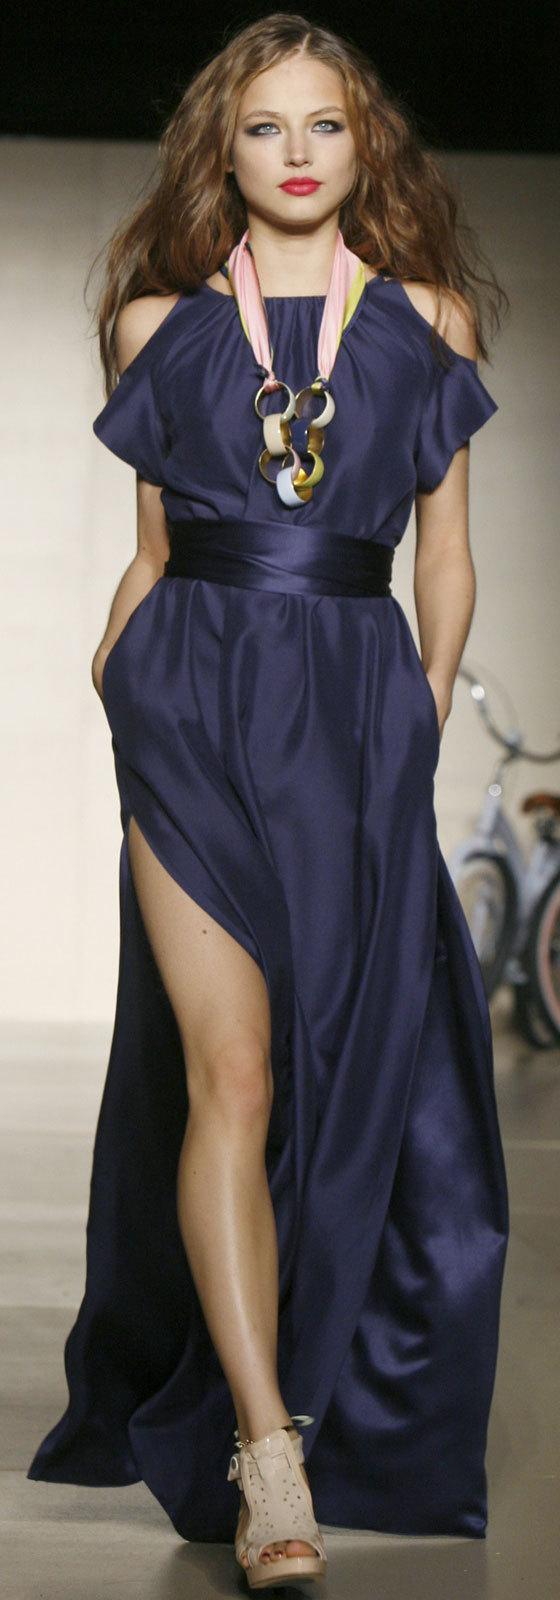 she so ghetto seriously mcmillan Ruslana Korshunova runway model